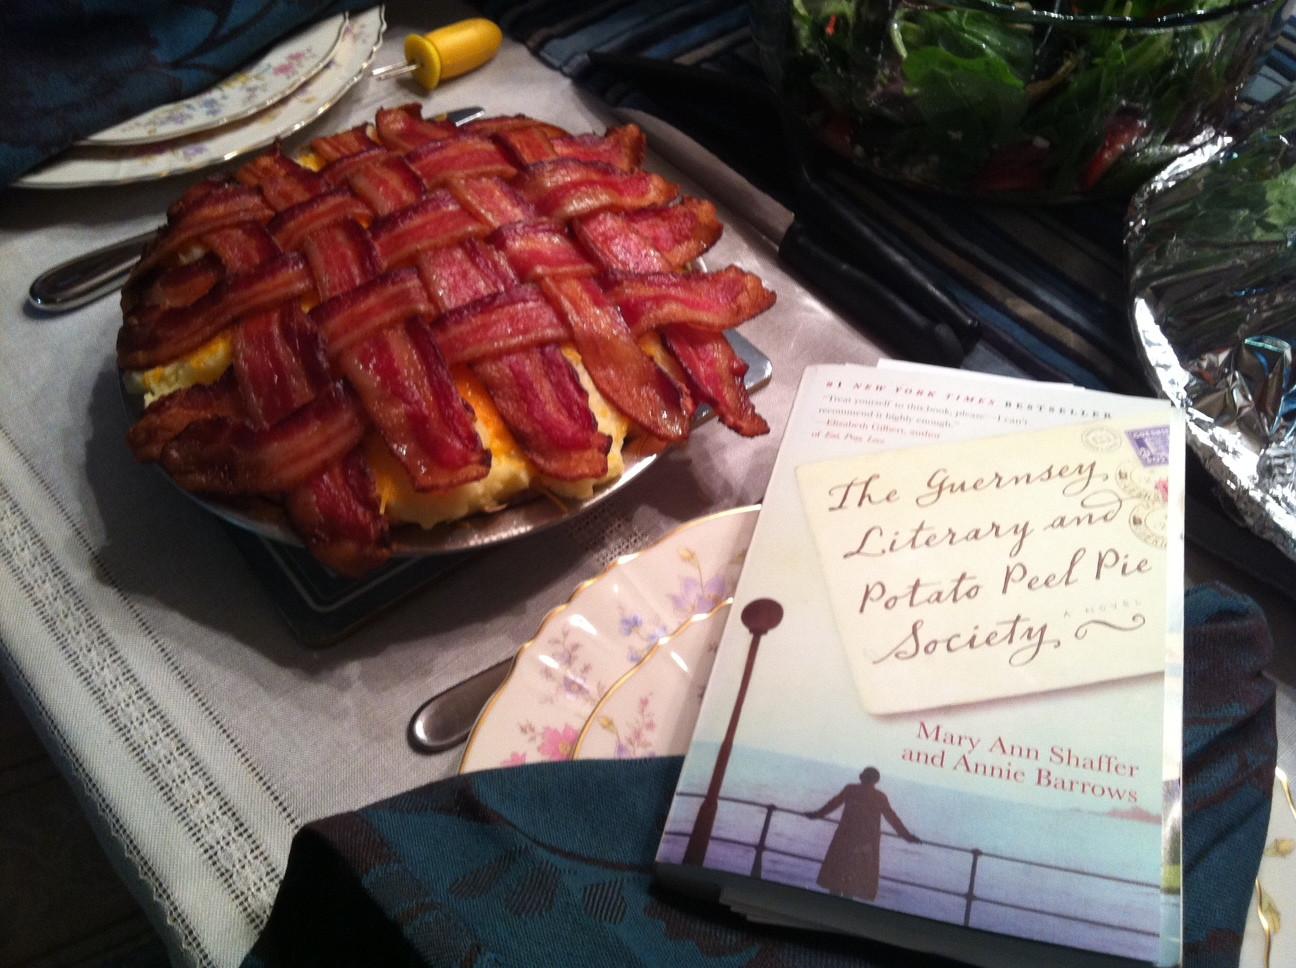 Potato Peel Pie Society  The Guernsey Literary & Potato Peel Pie Society